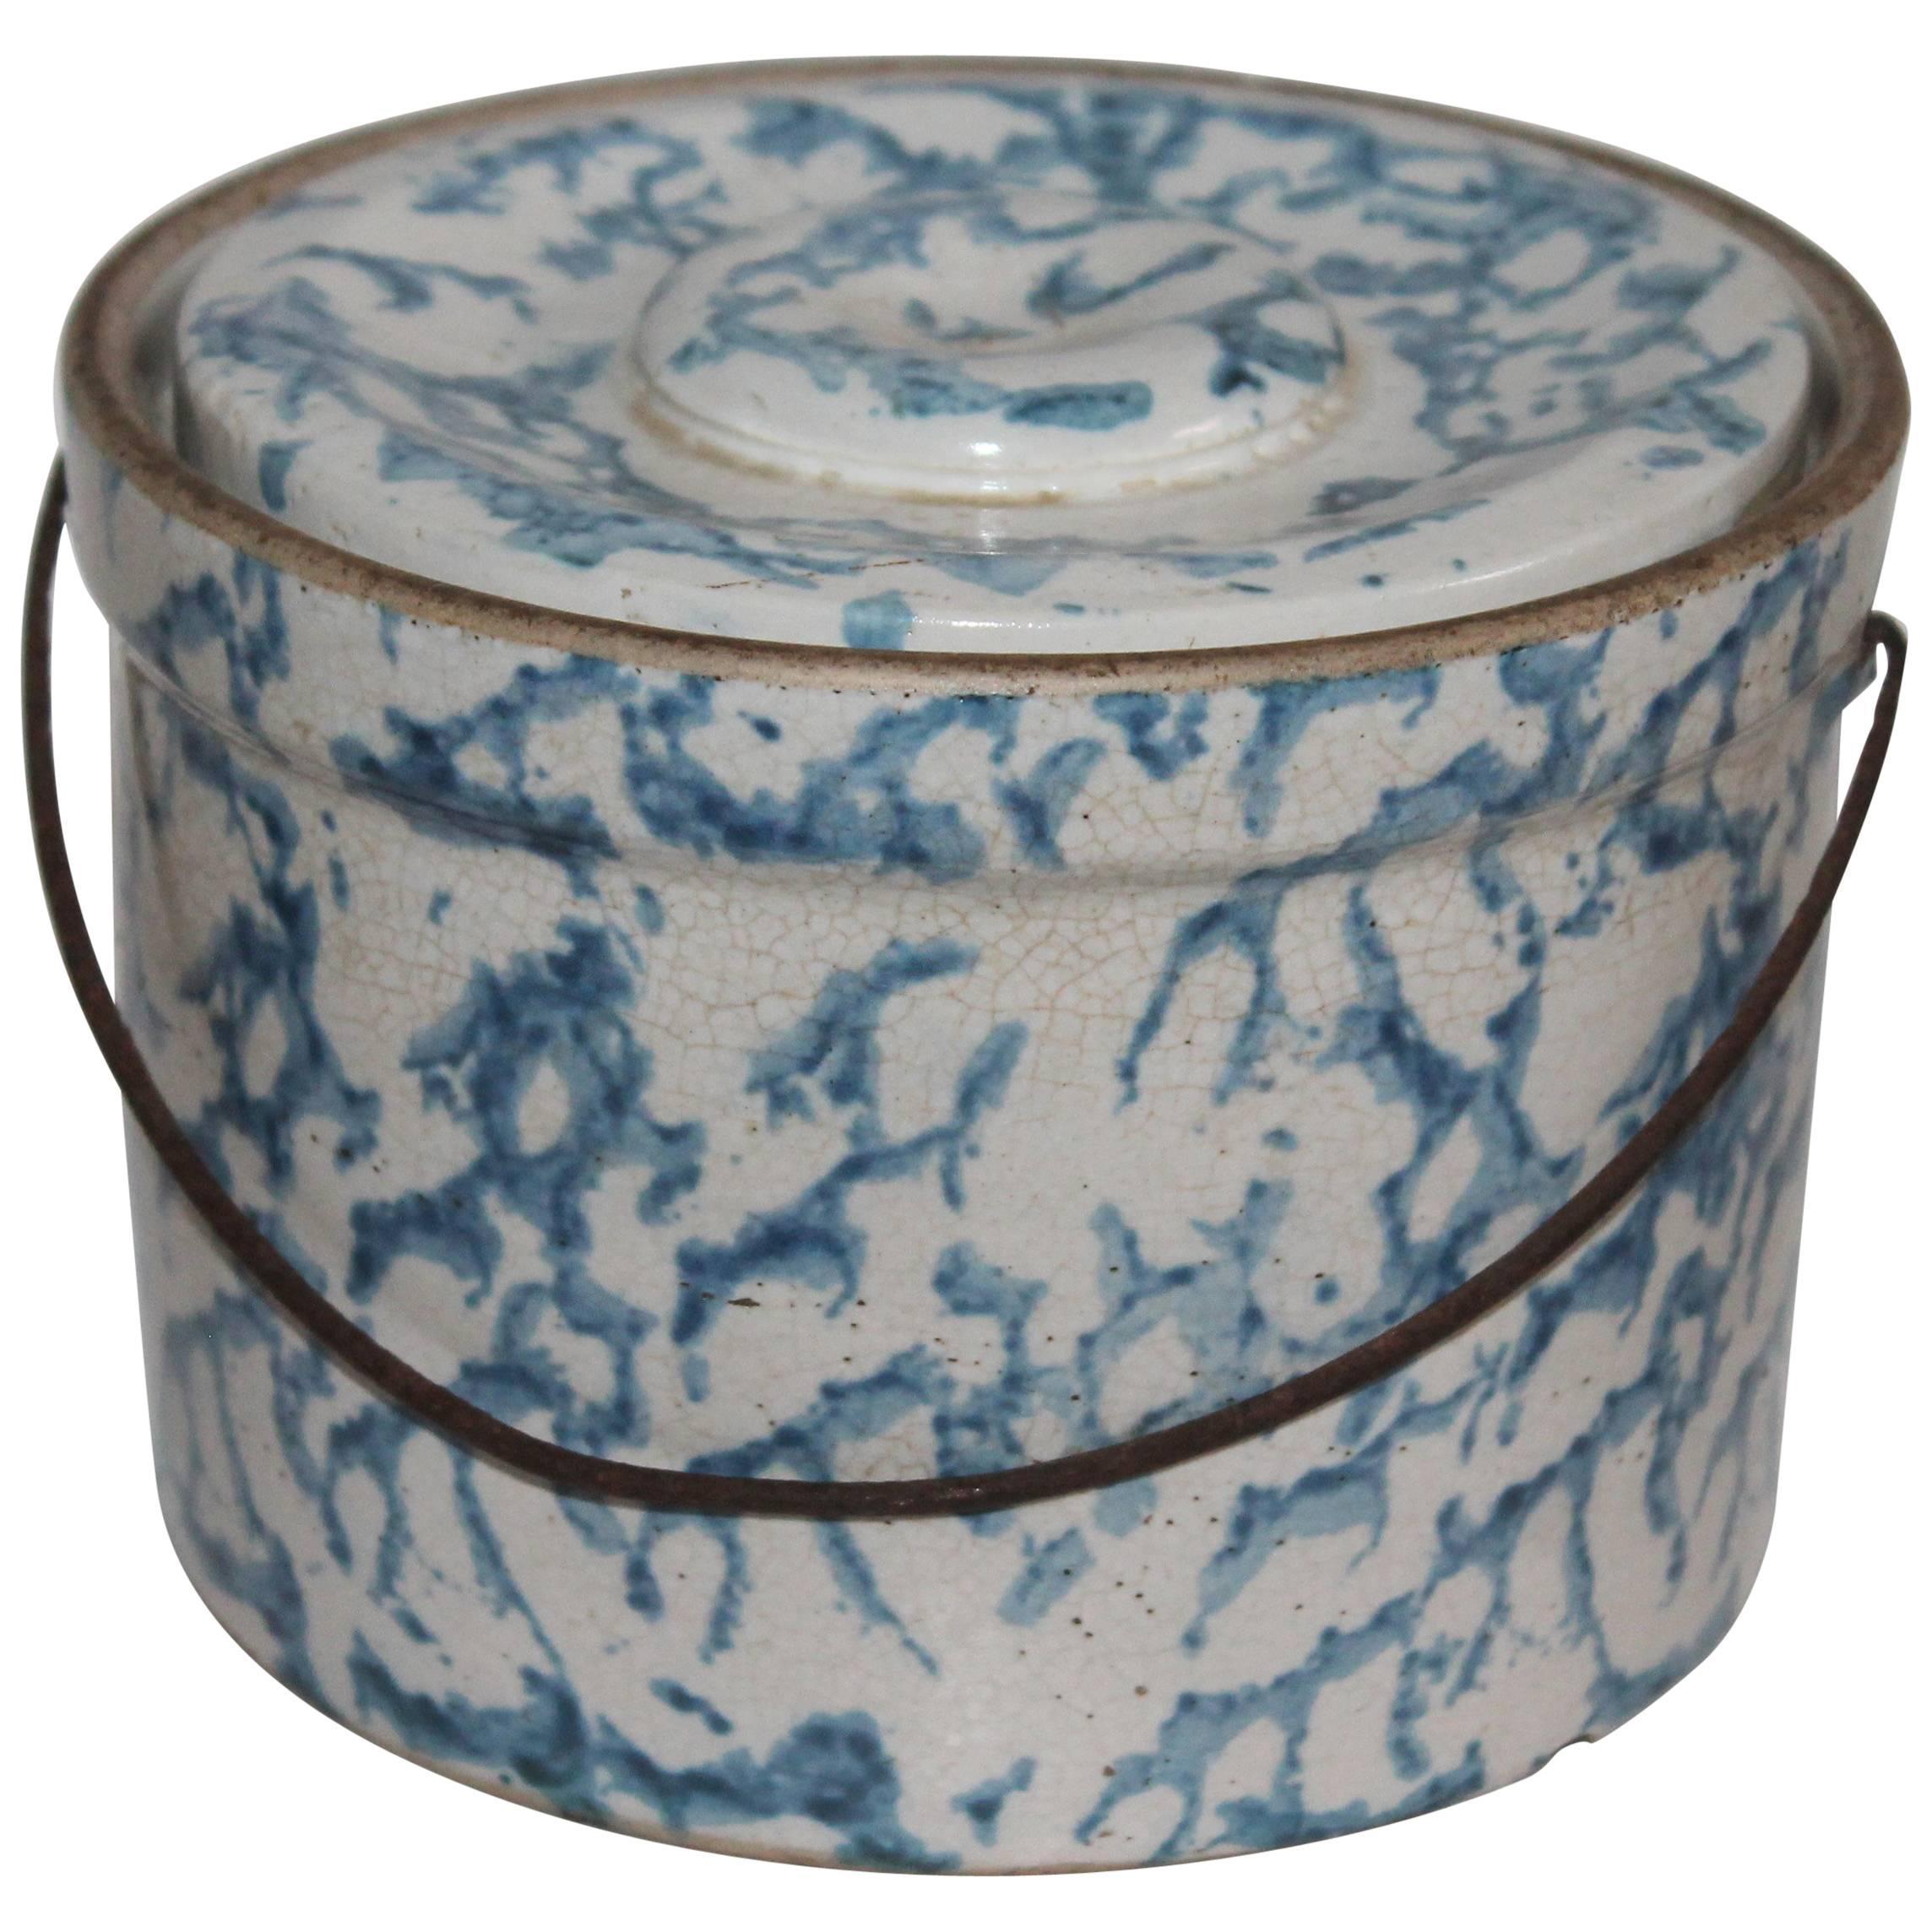 19th Century Spongeware Salt Crock with Bail Handle